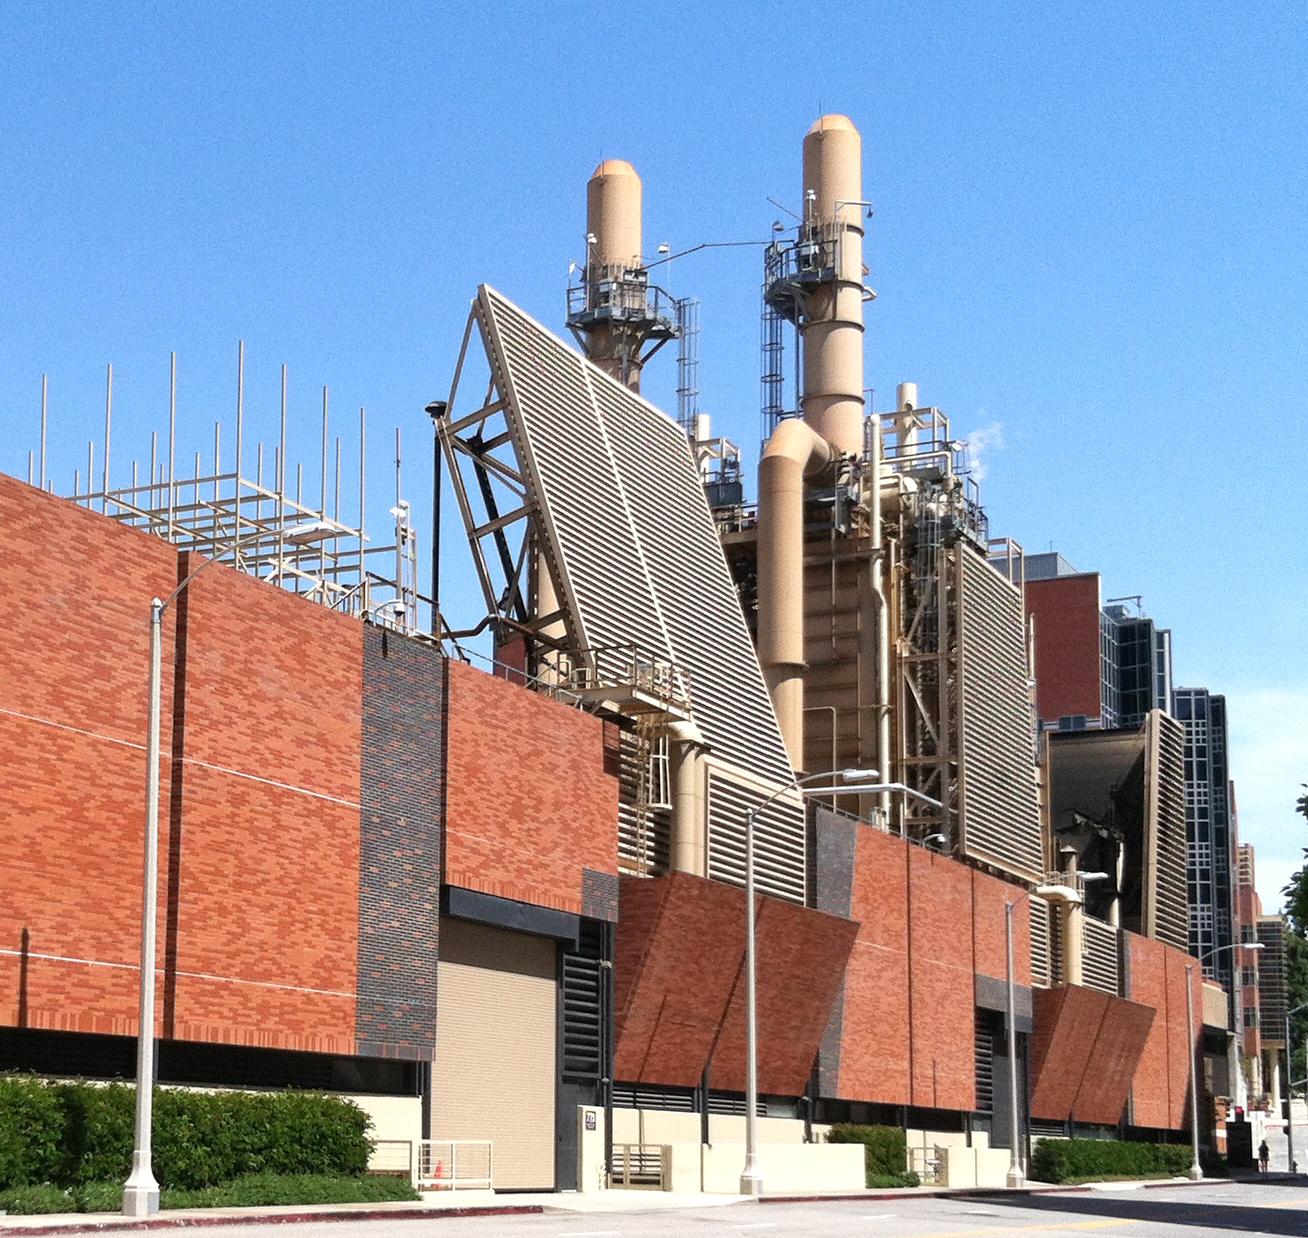 UCLA Cogeneration Chiller Facility